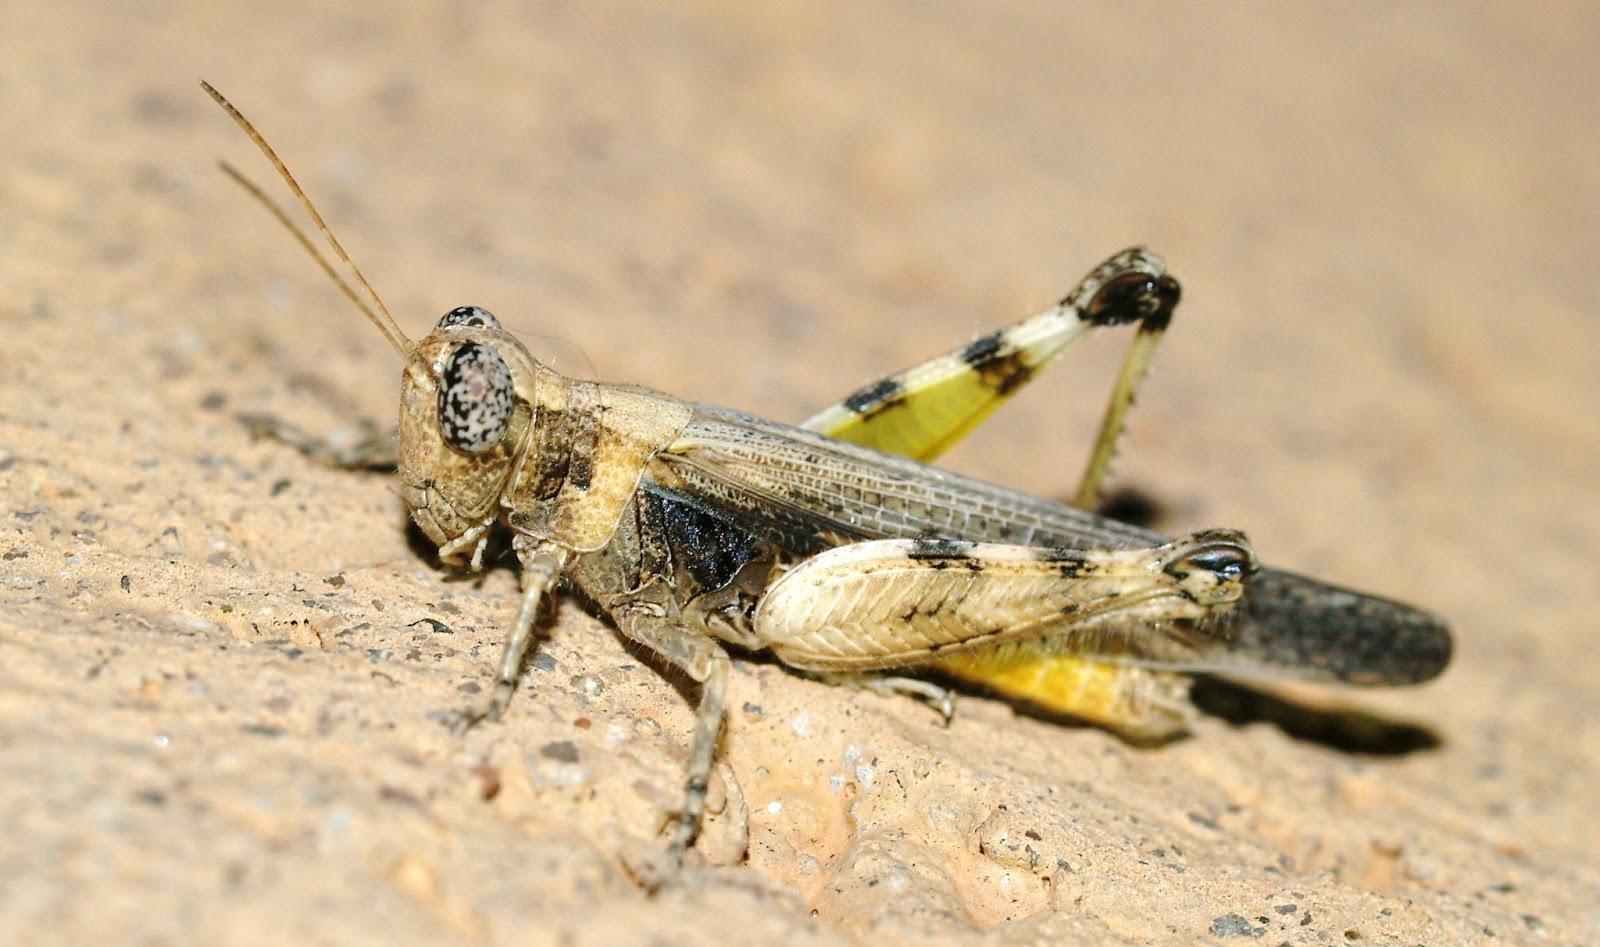 Arizona Beetles Bugs Birds And More July 2013